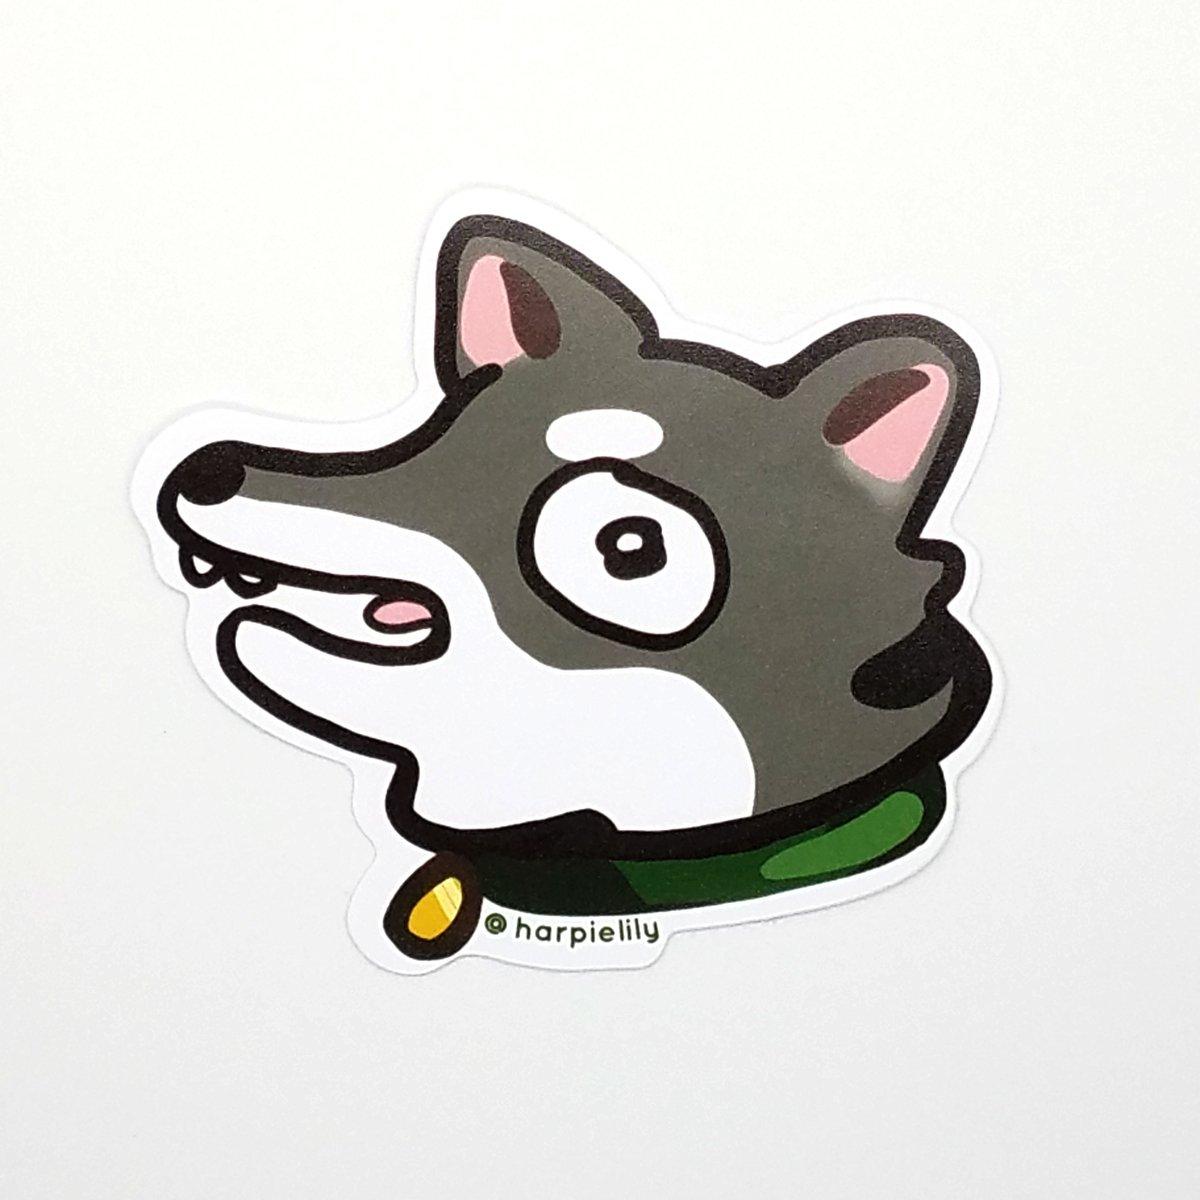 Image of Hyper Doggo vinyl sticker